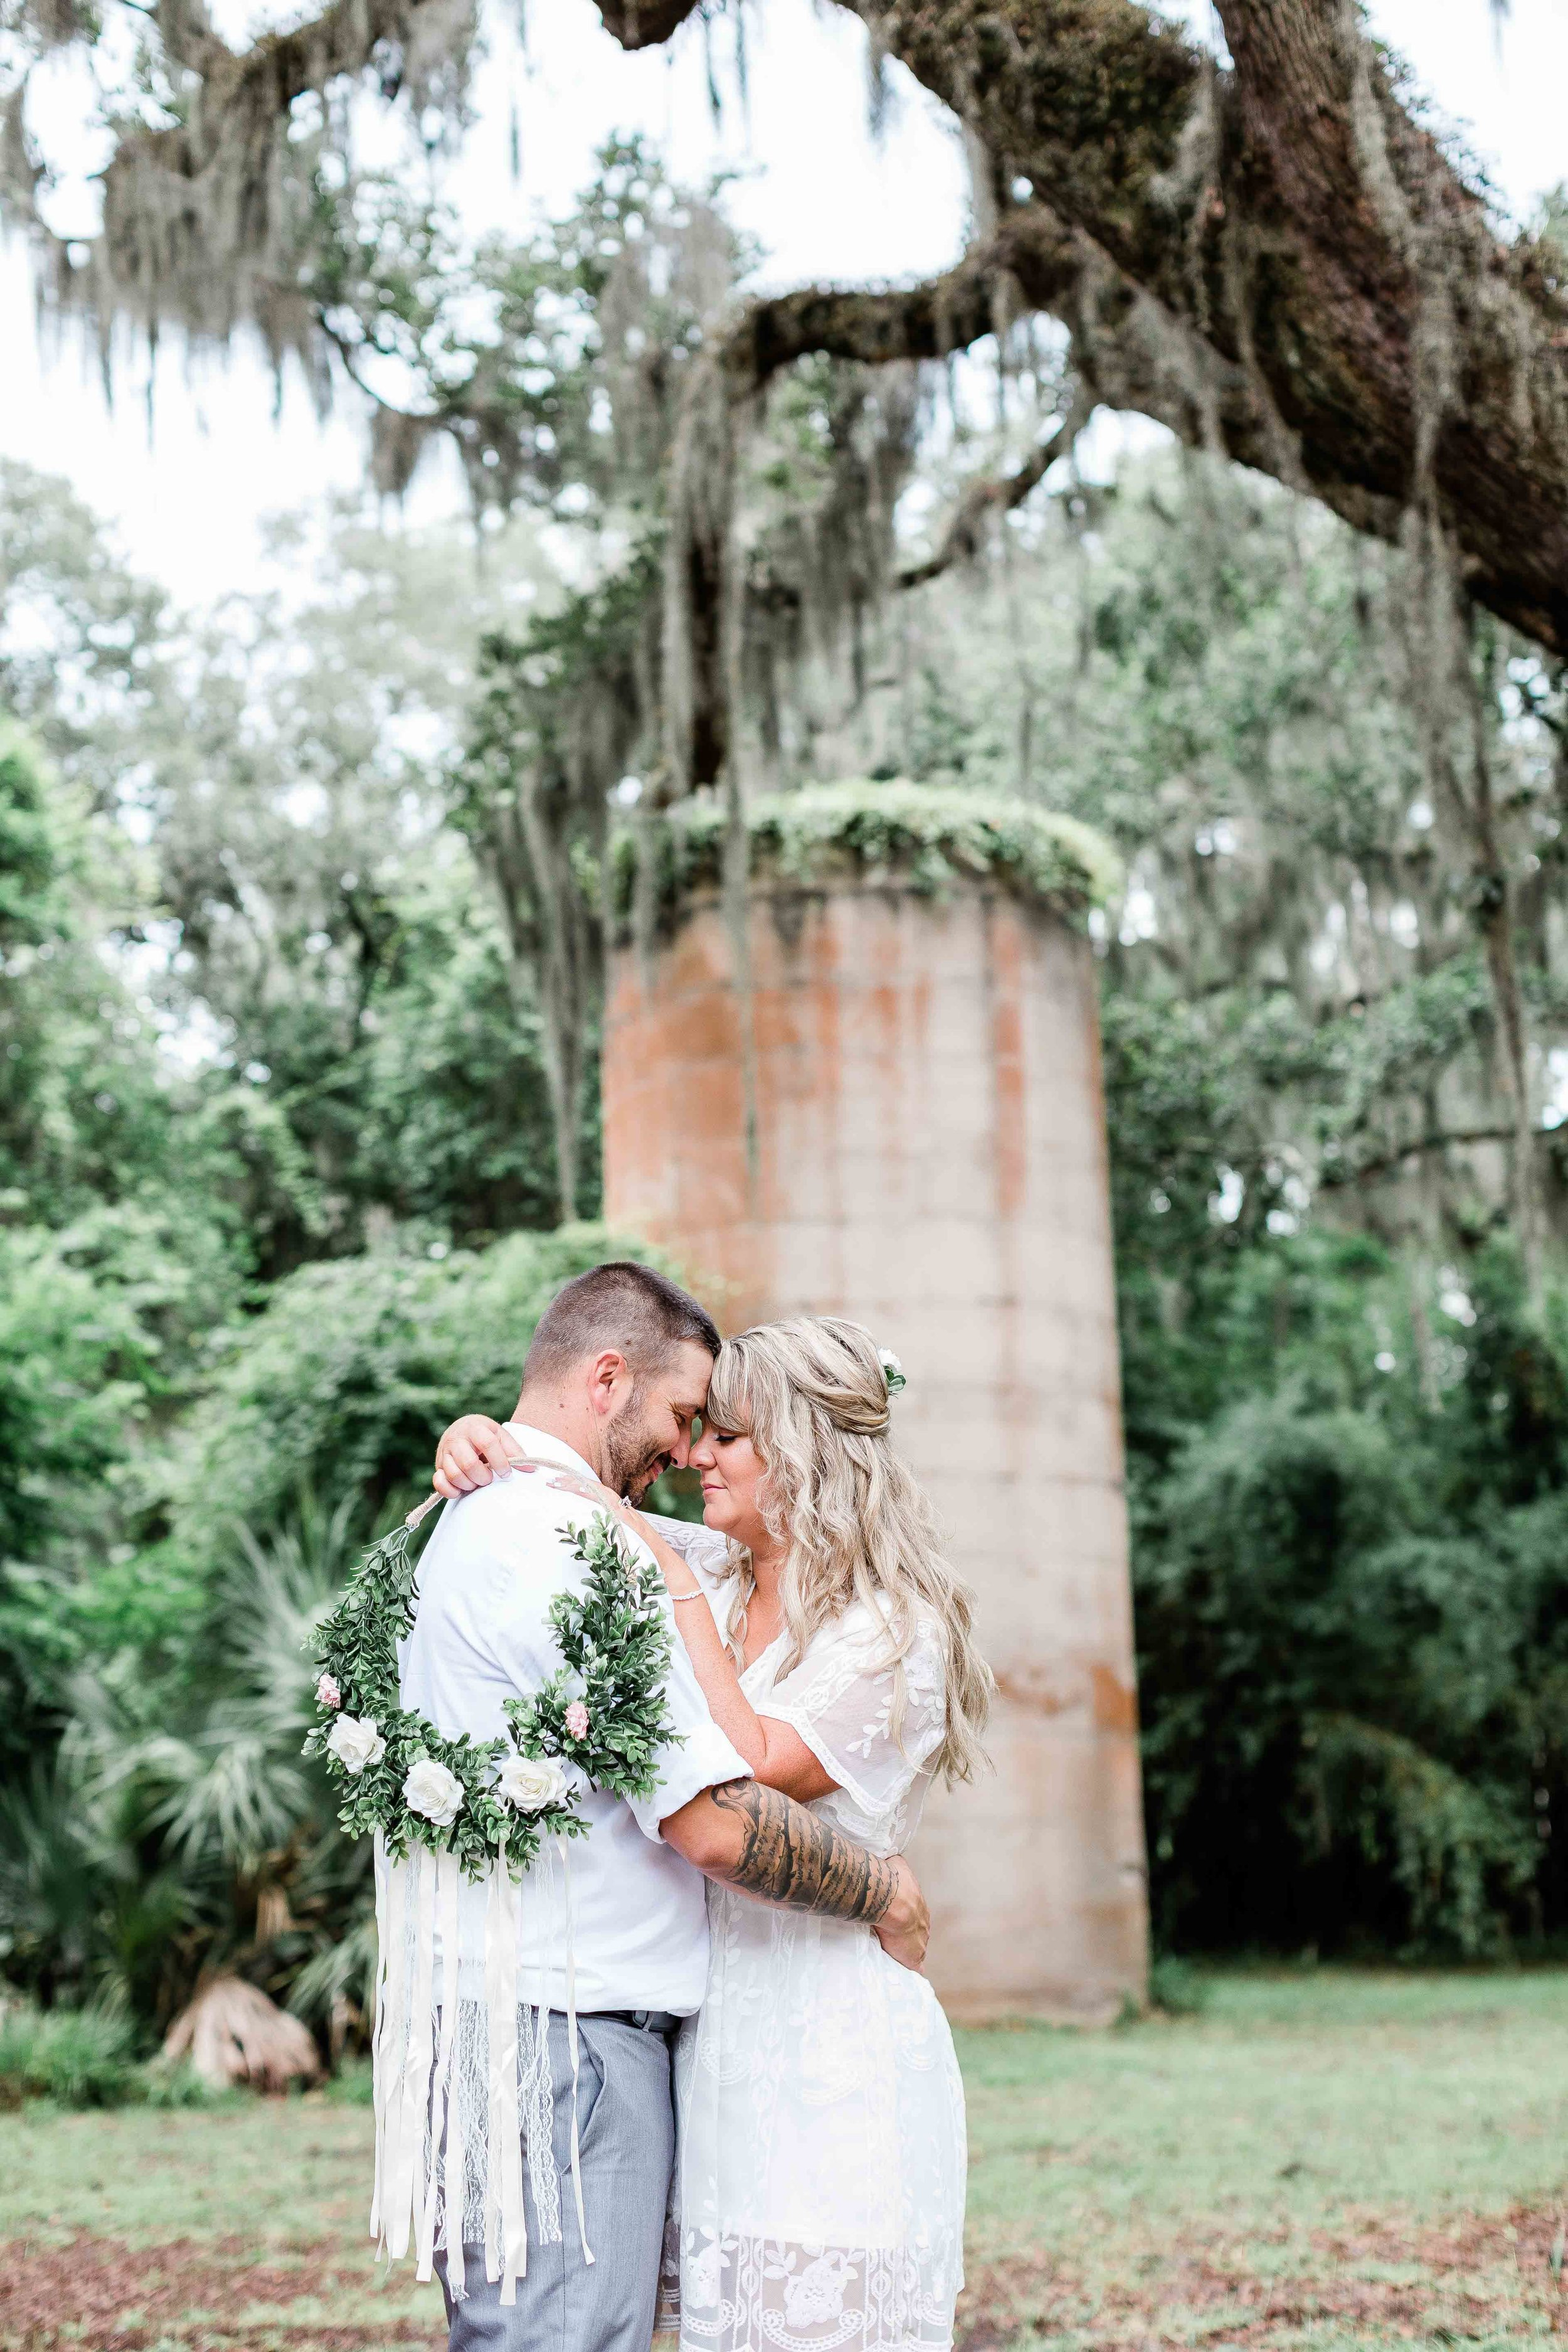 20190727Georgia-Wormlsoe Plantation-Simply Eloped-Savannah Wedding Photographer- Southern Lens Photography25.jpg